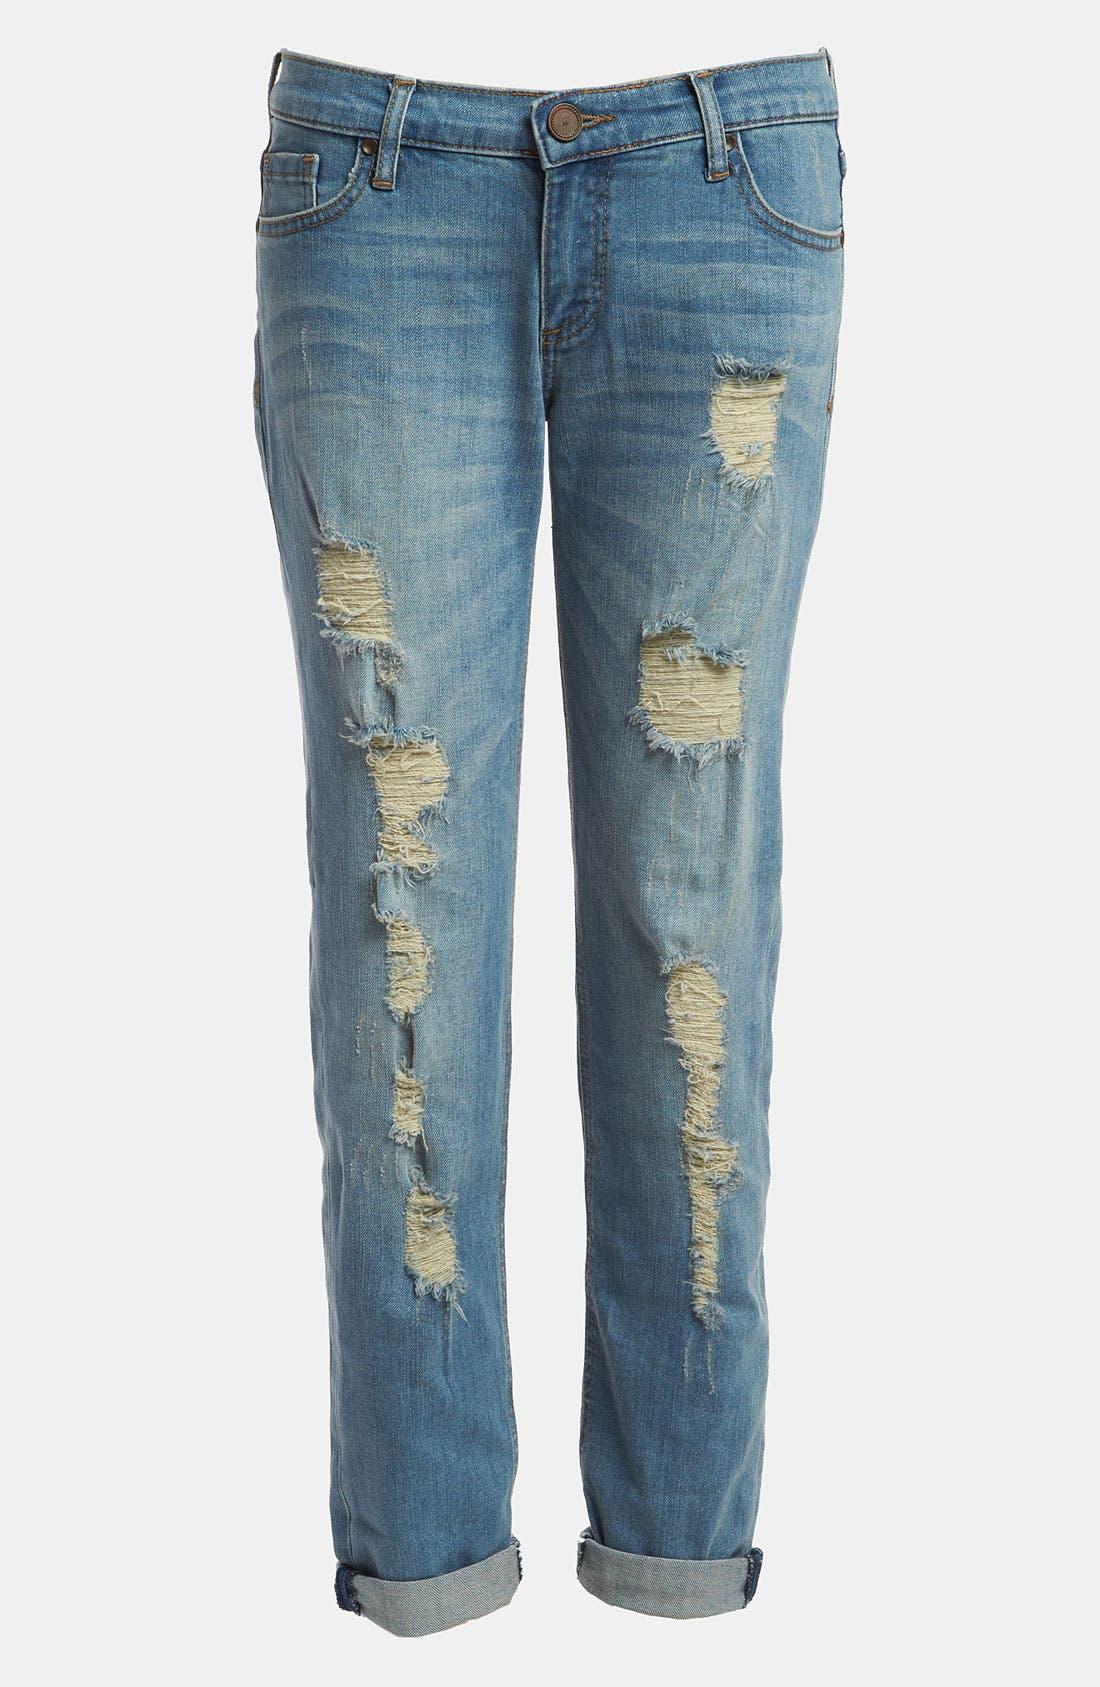 EDYSON 'Soho' Relaxed Boyfriend Jeans, Main, color, 400